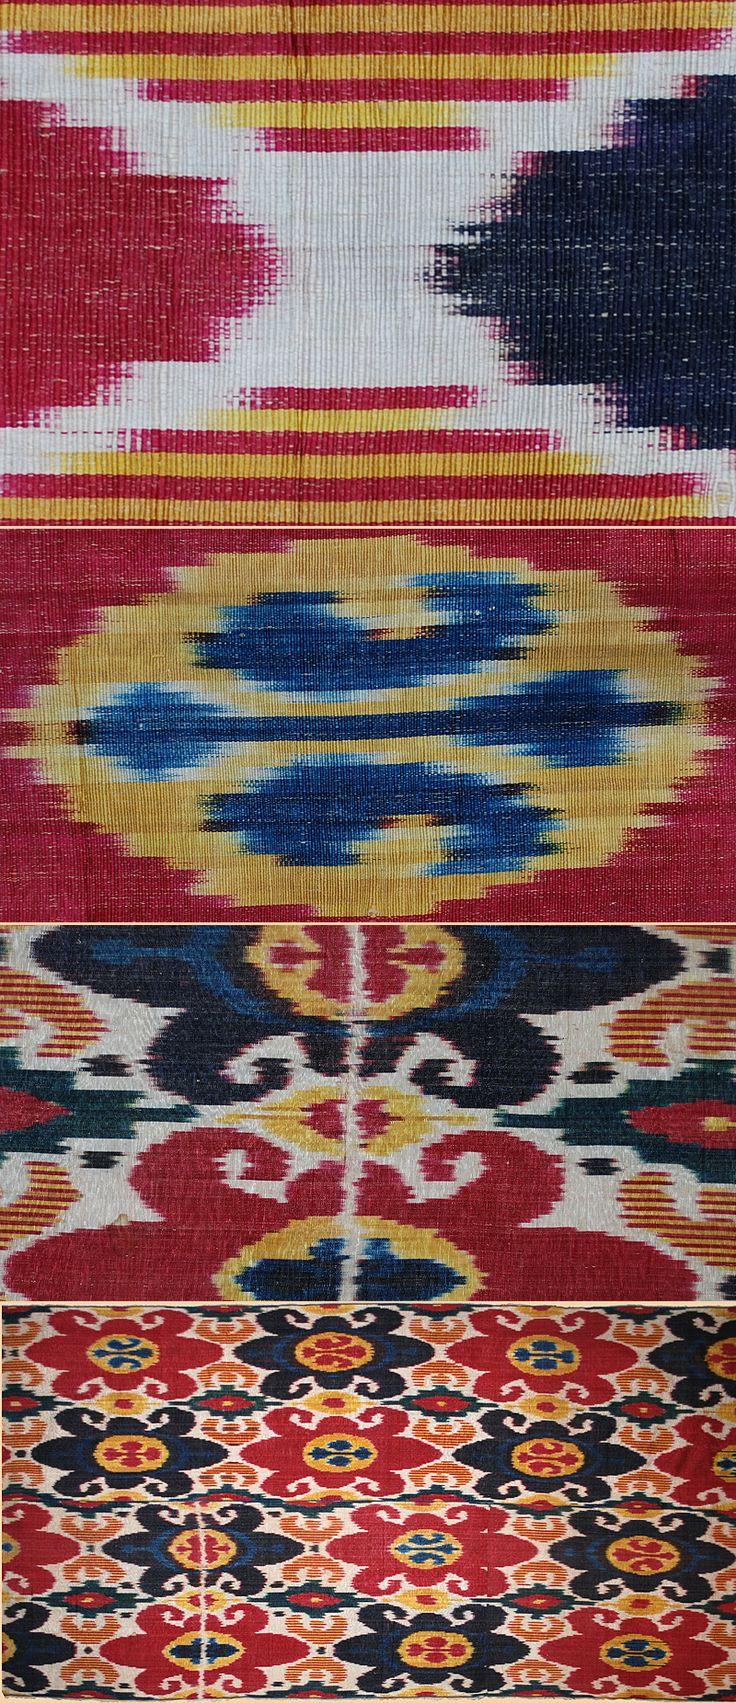 1154 Best Central Asia Textile Art Images On Pinterest